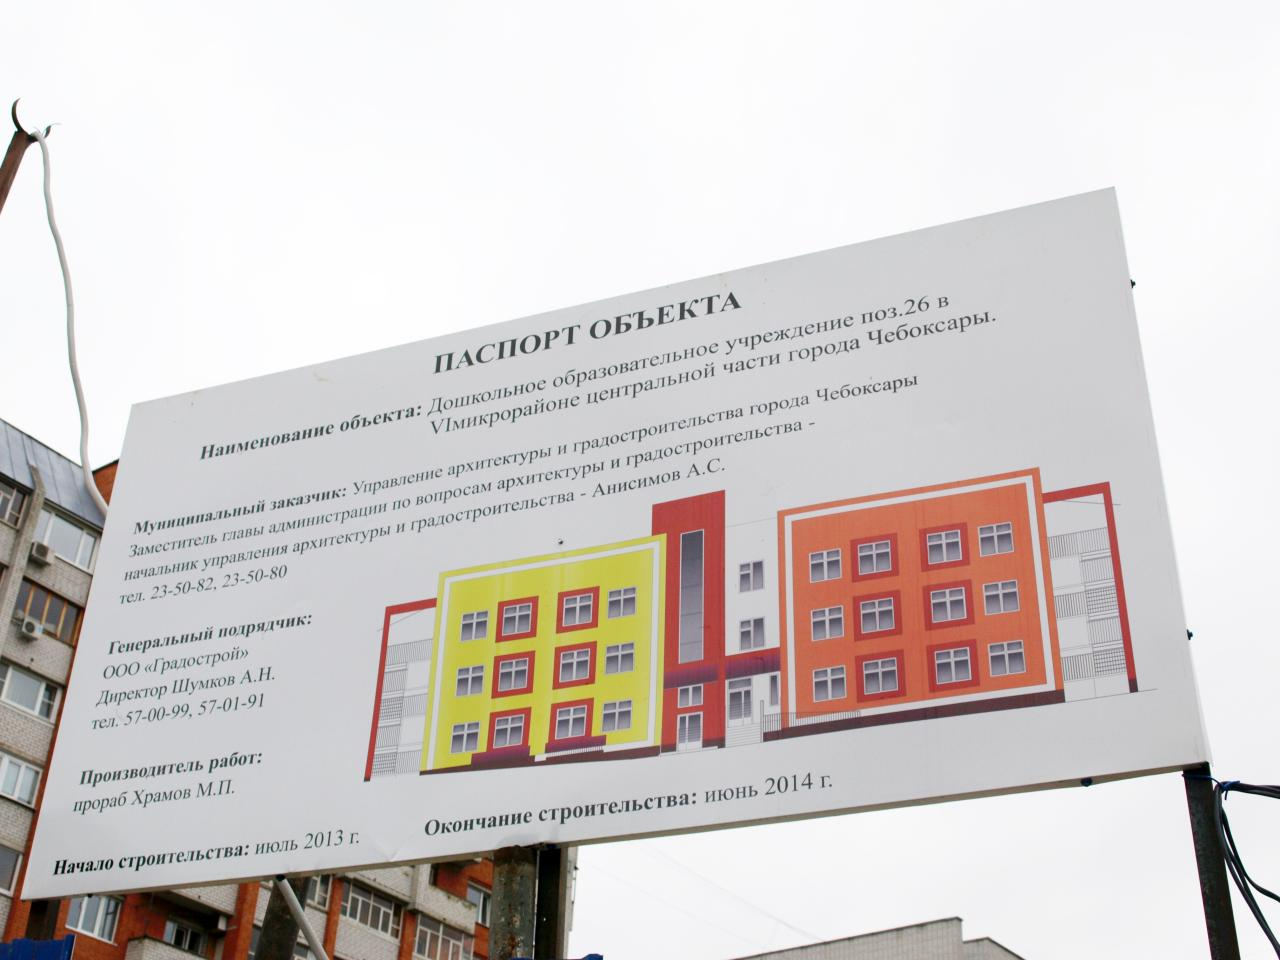 Детский сад в VI микрорайоне Центра Чебоксар, Крылова позиция 26